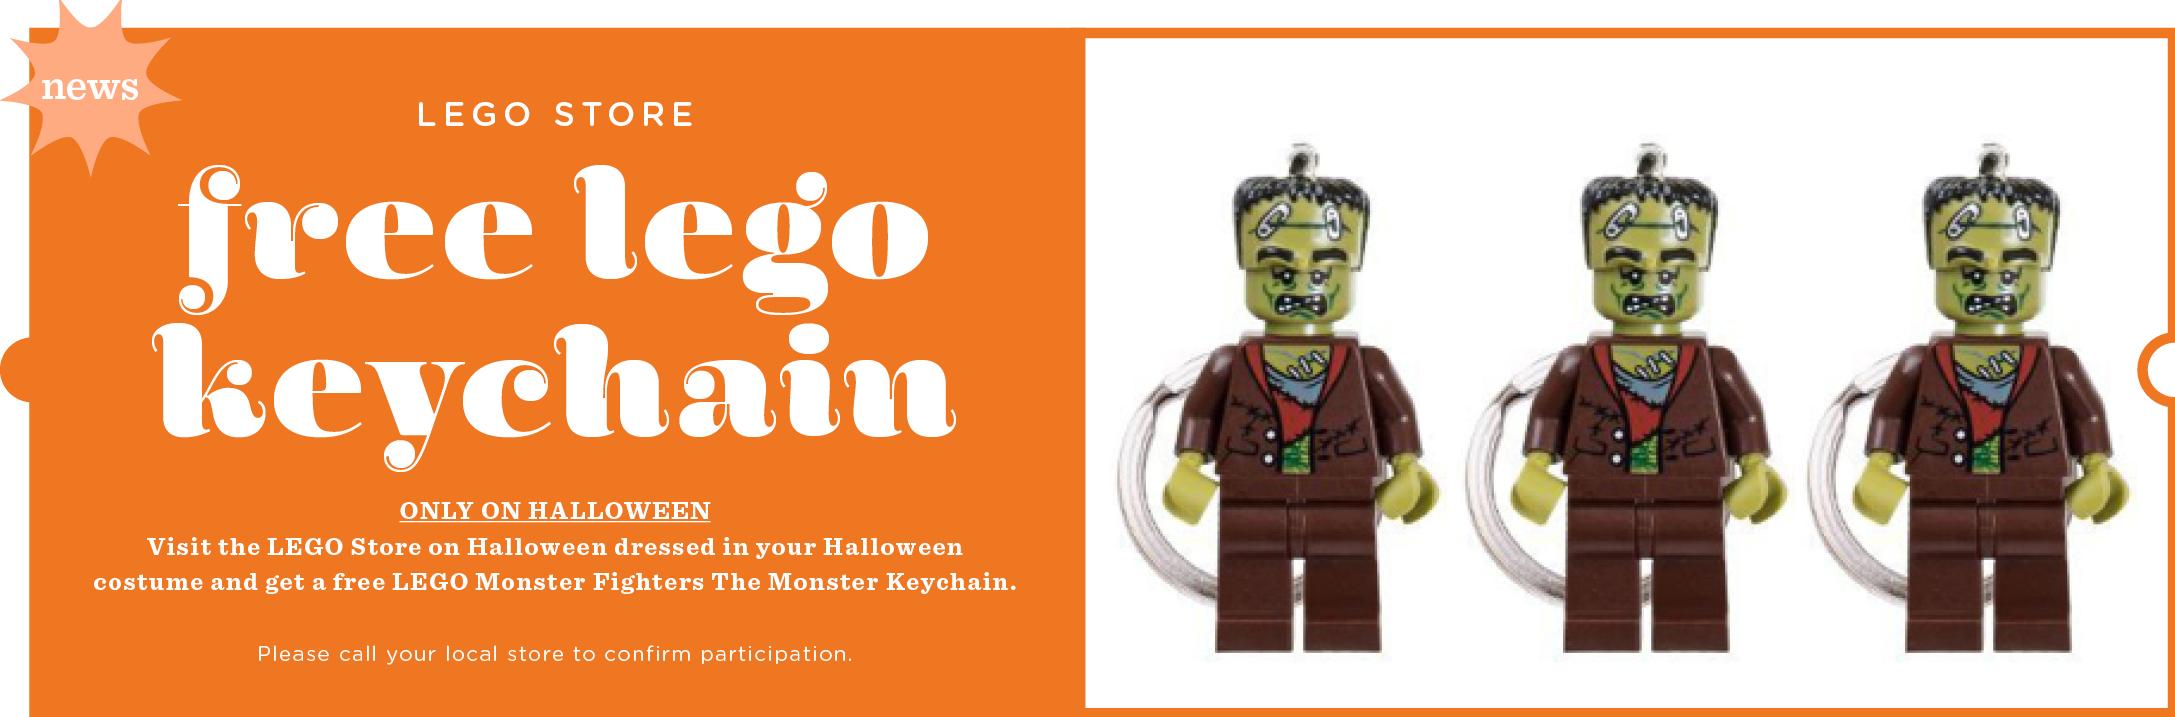 Lego Keychain_POST.jpg